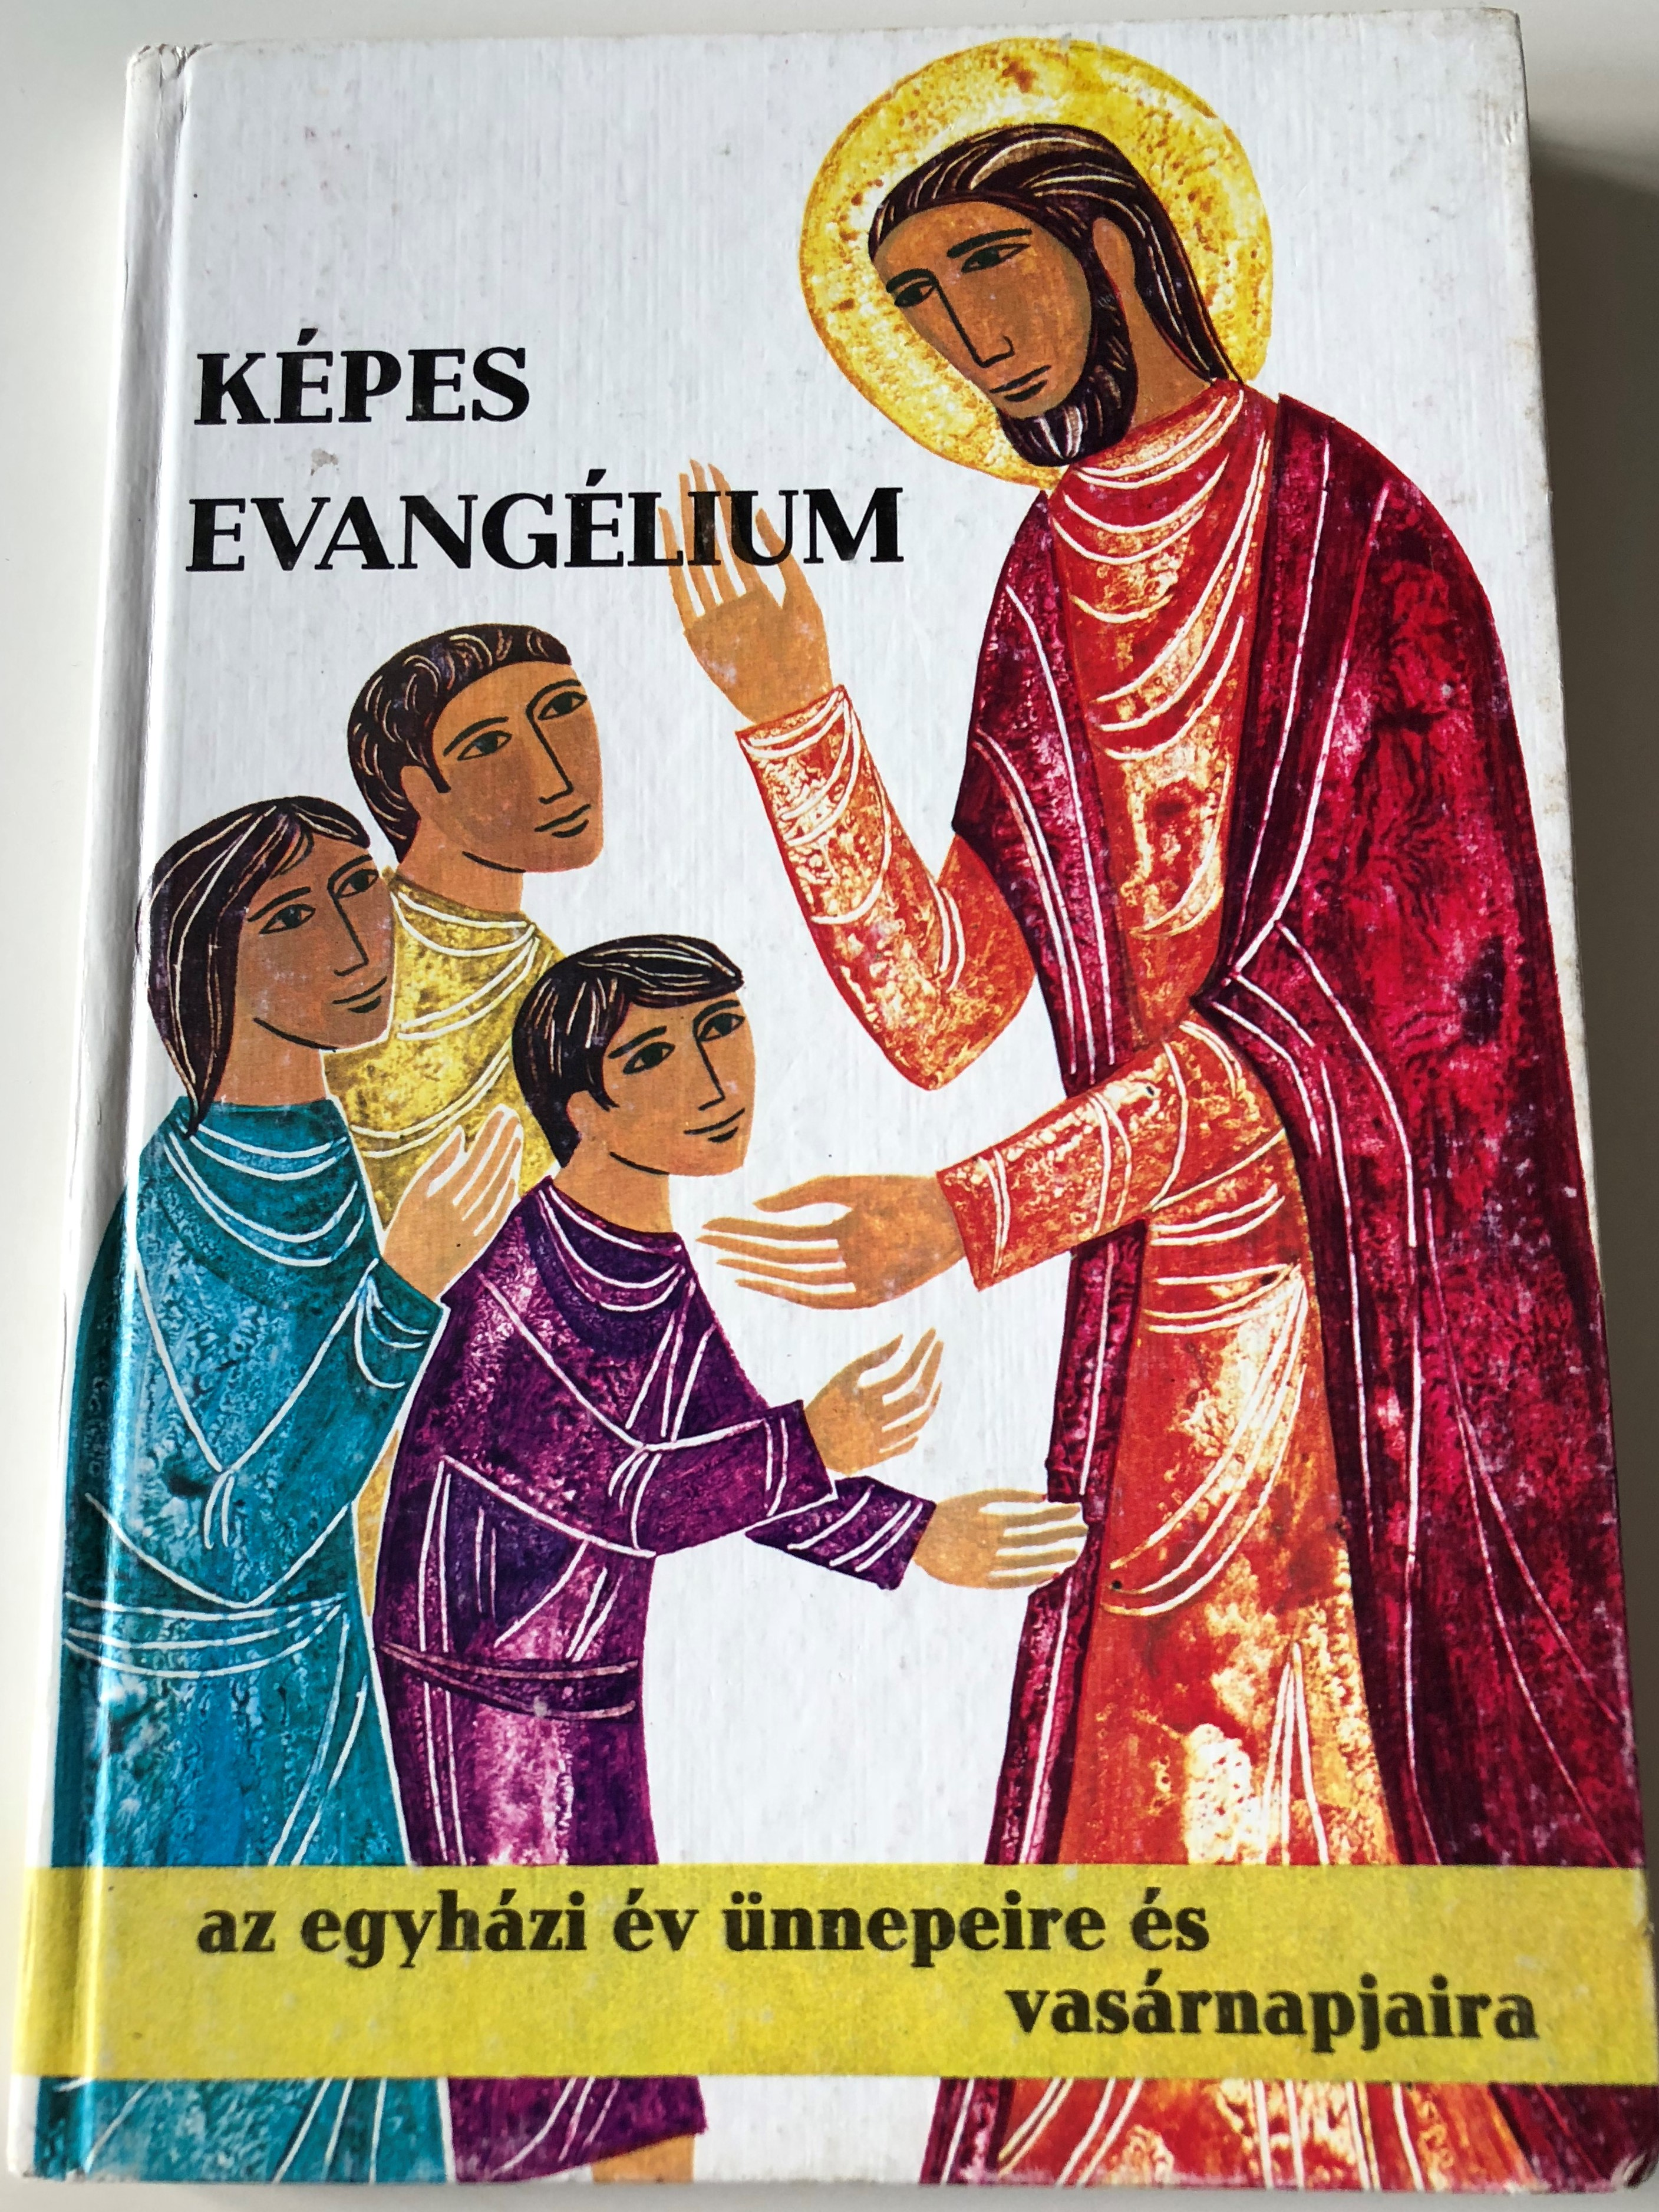 k-pes-evang-lium-by-k.-kammelberger-az-egyh-zi-v-nnepeire-s-vas-rnapjaira-hungarian-translation-of-bilderbibel-zum-neuen-kirchenjahr-illustration-h.-bledl-szent-istv-n-t-rsulat-1-.jpg